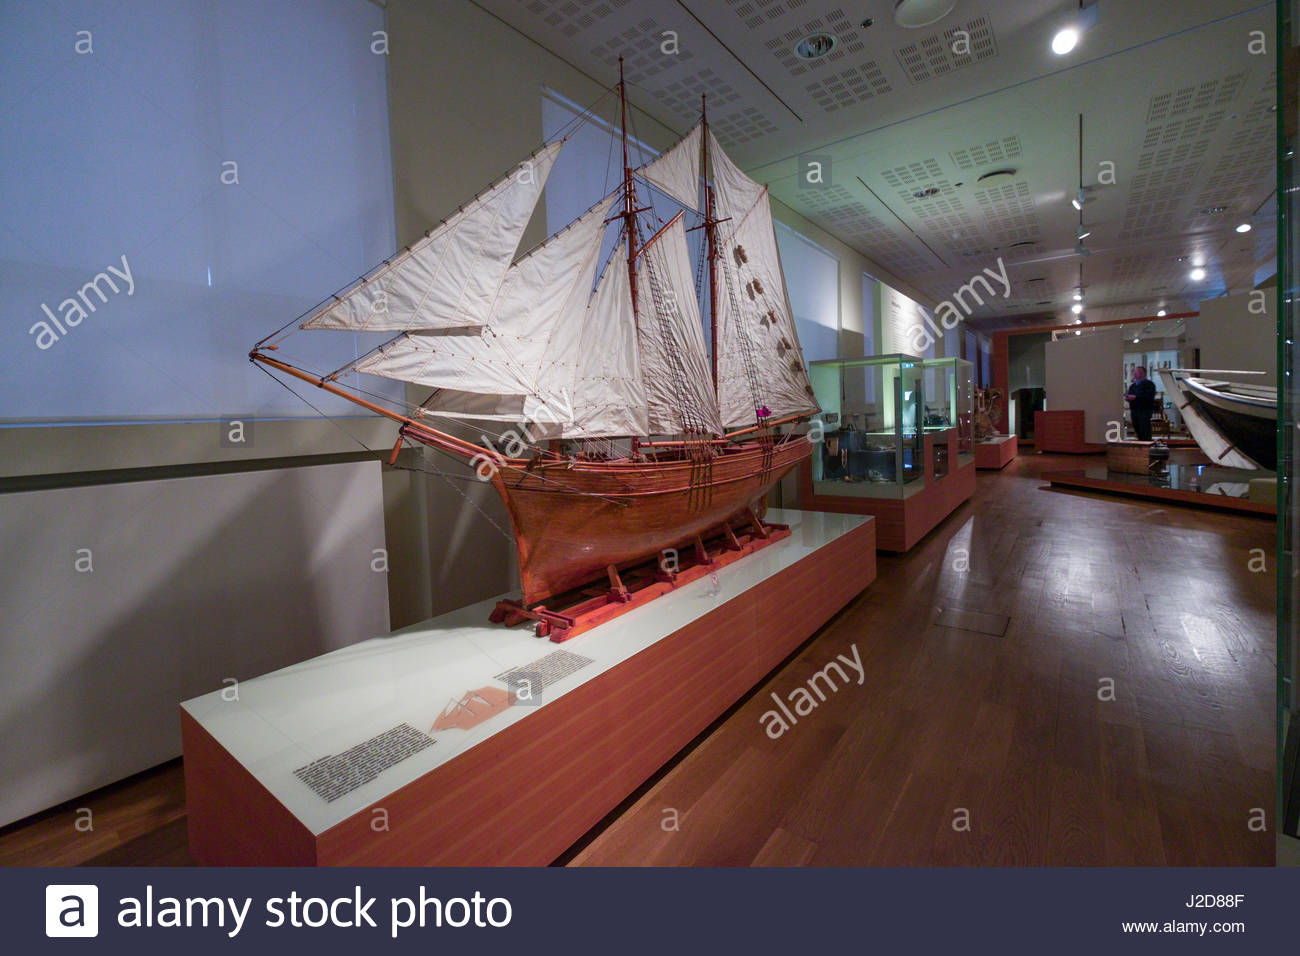 Exhibits and displays inside the National Museum of Iceland, Þjóðminjasafn Íslands, Miðborg, - Stock Image